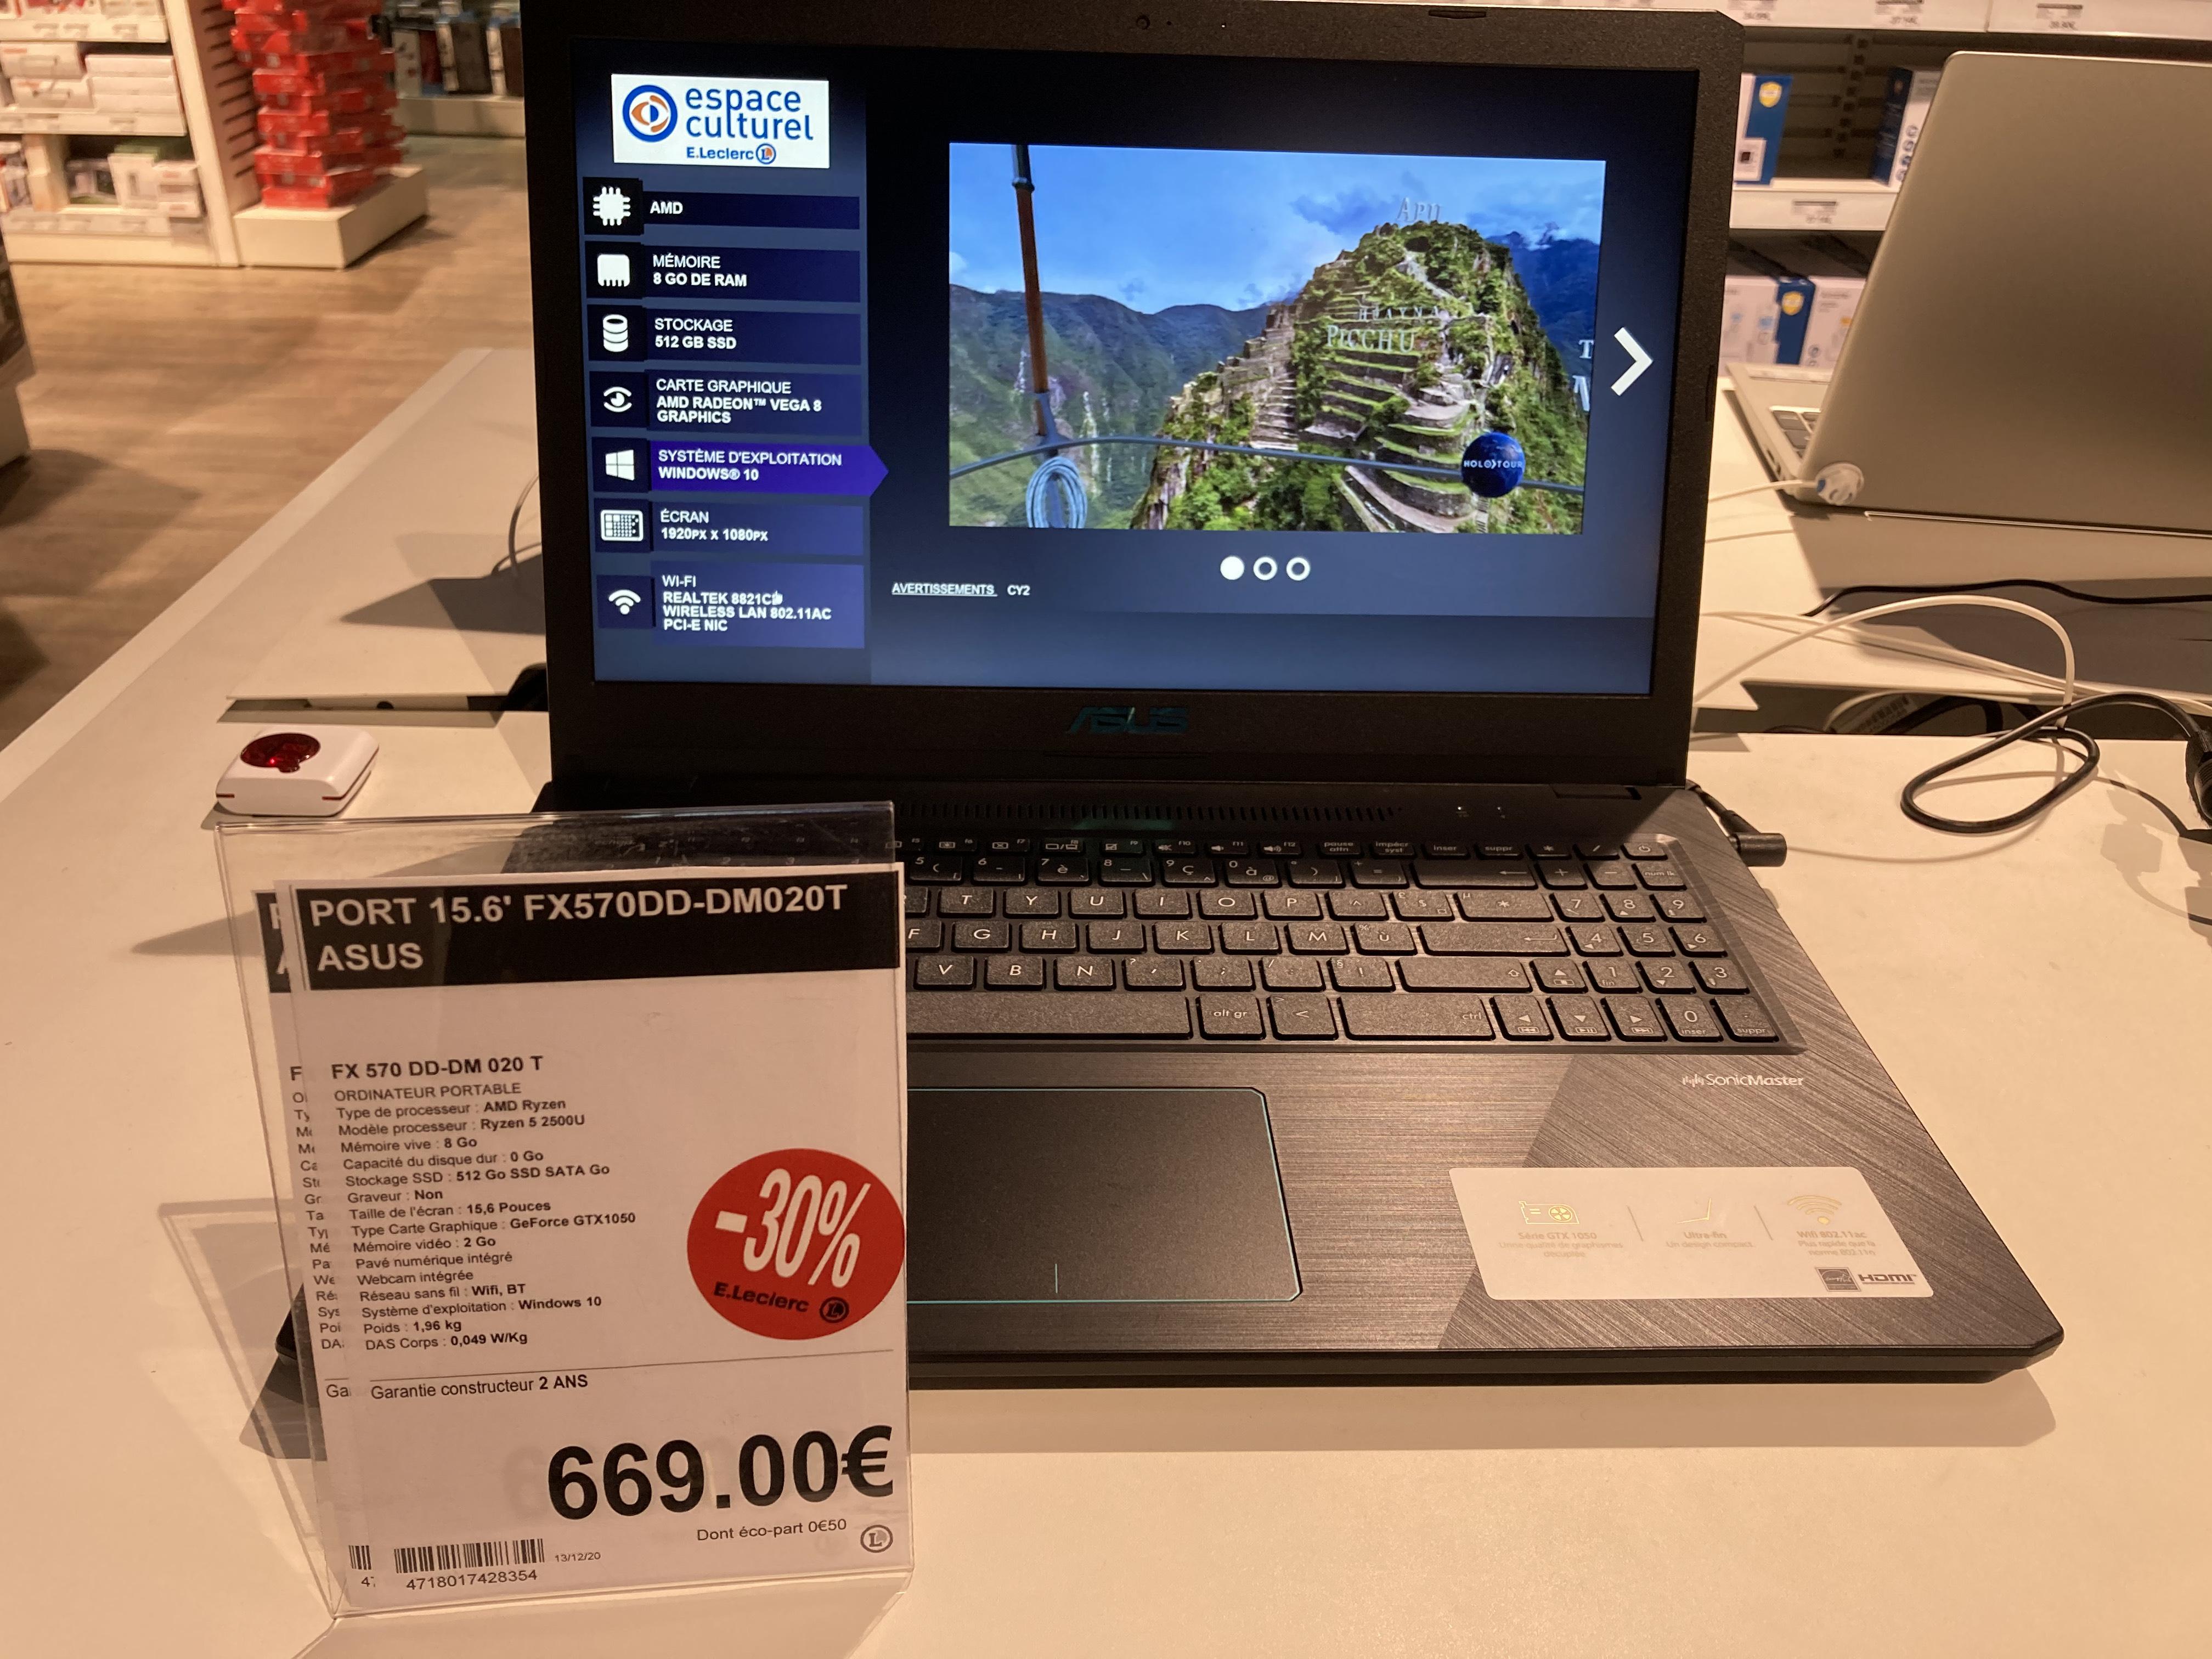 "Pc Portable 15"" Asus FX570DD-DM020T -R5-2500U, 8 Go de RAM, SSD 512 Go, GTX 1050 (2 Go), Windows 10(via 200€ en bon d'achat) - L'aigle (61)"